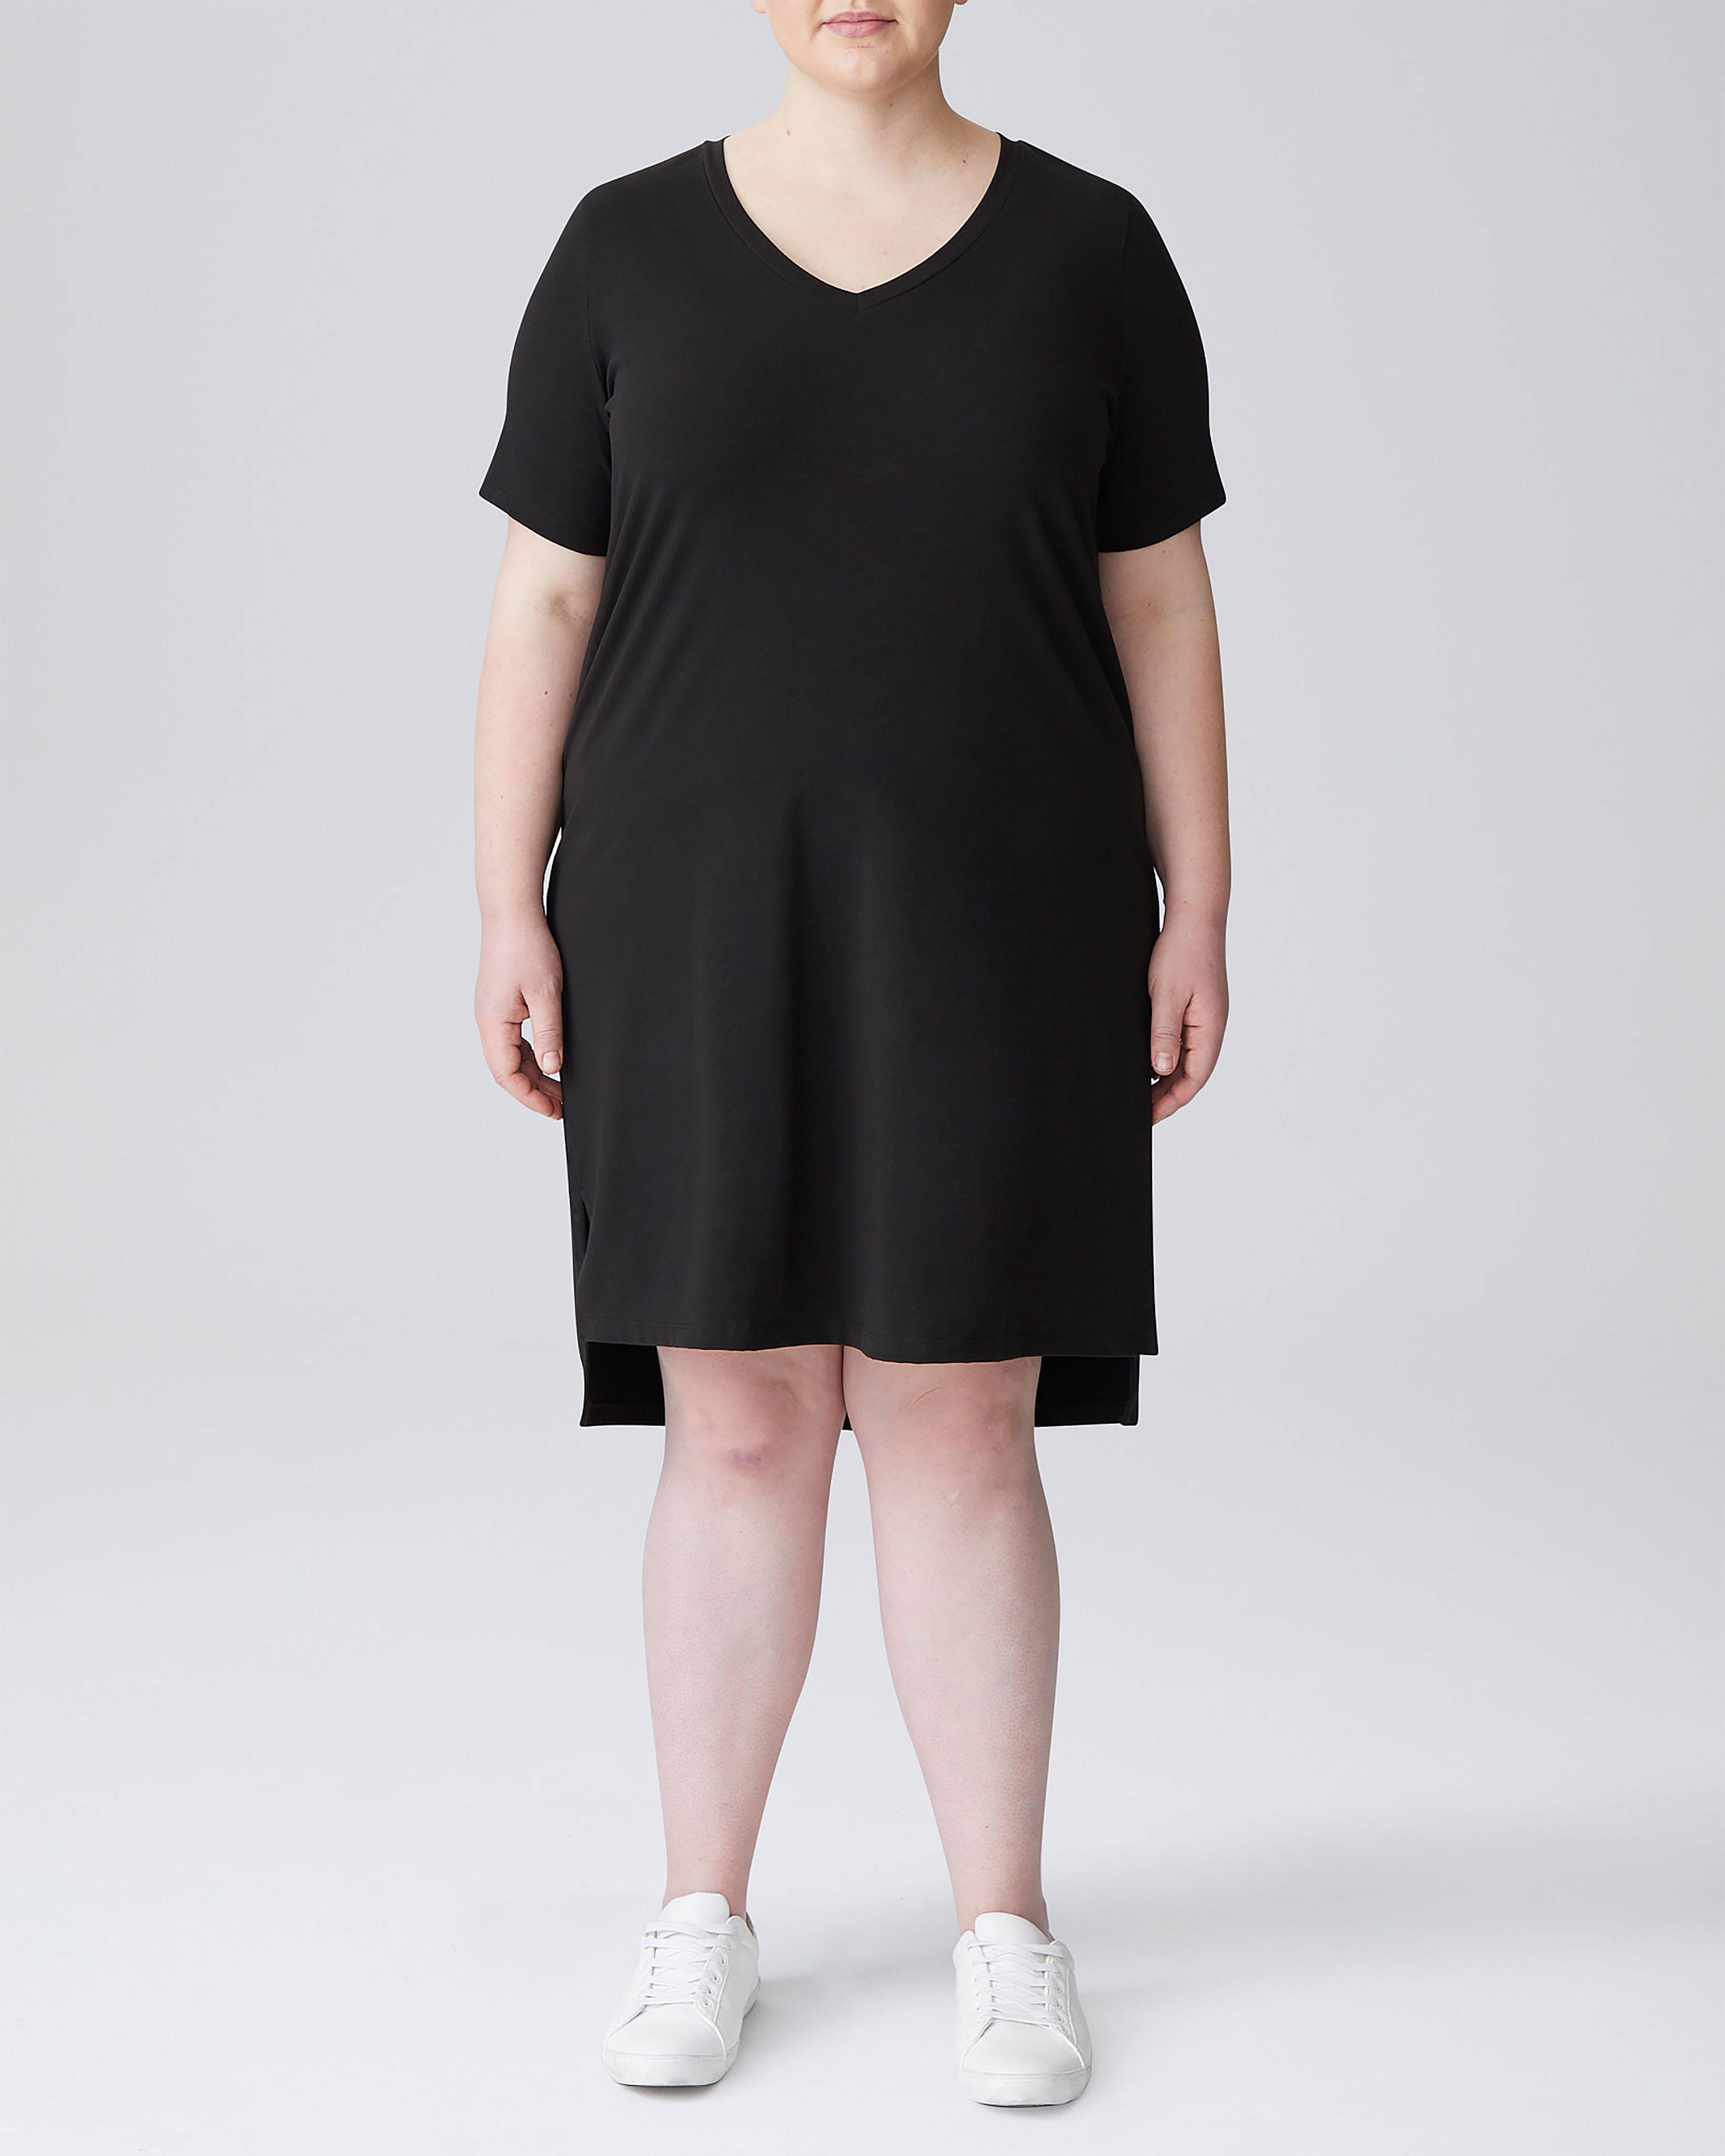 Tesino Washed Jersey Dress - Navy